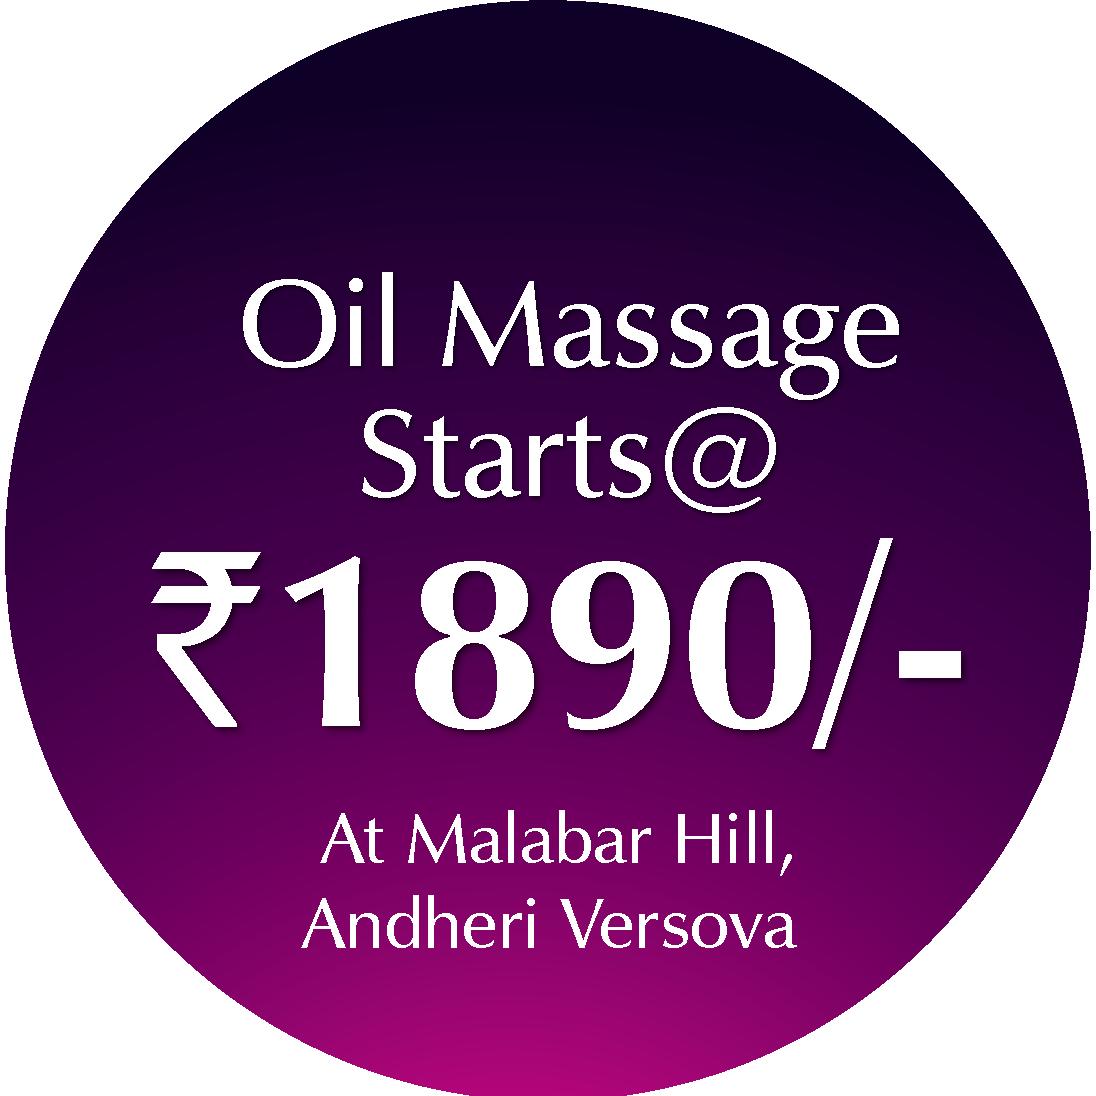 Oil Massage @ 1890